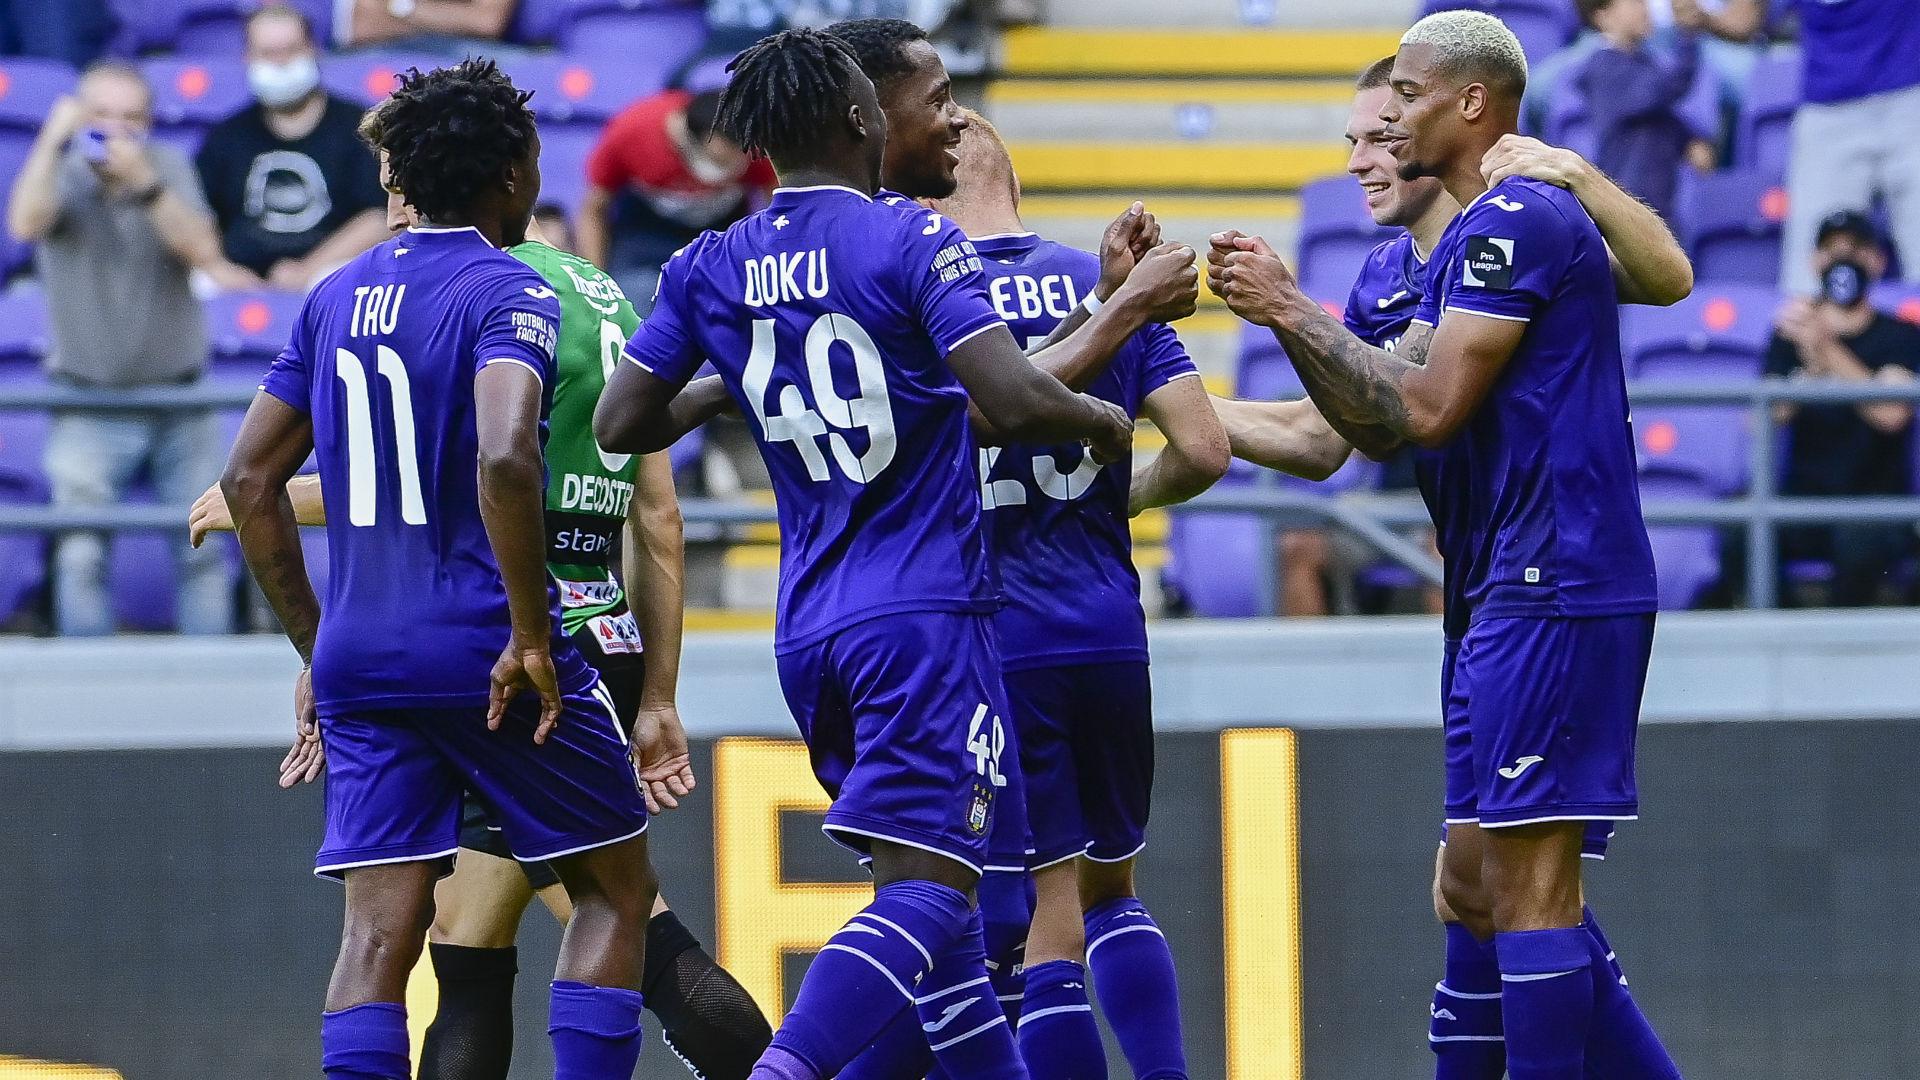 Percy Tau scores to help Anderlecht return to winning ways against Kortrijk